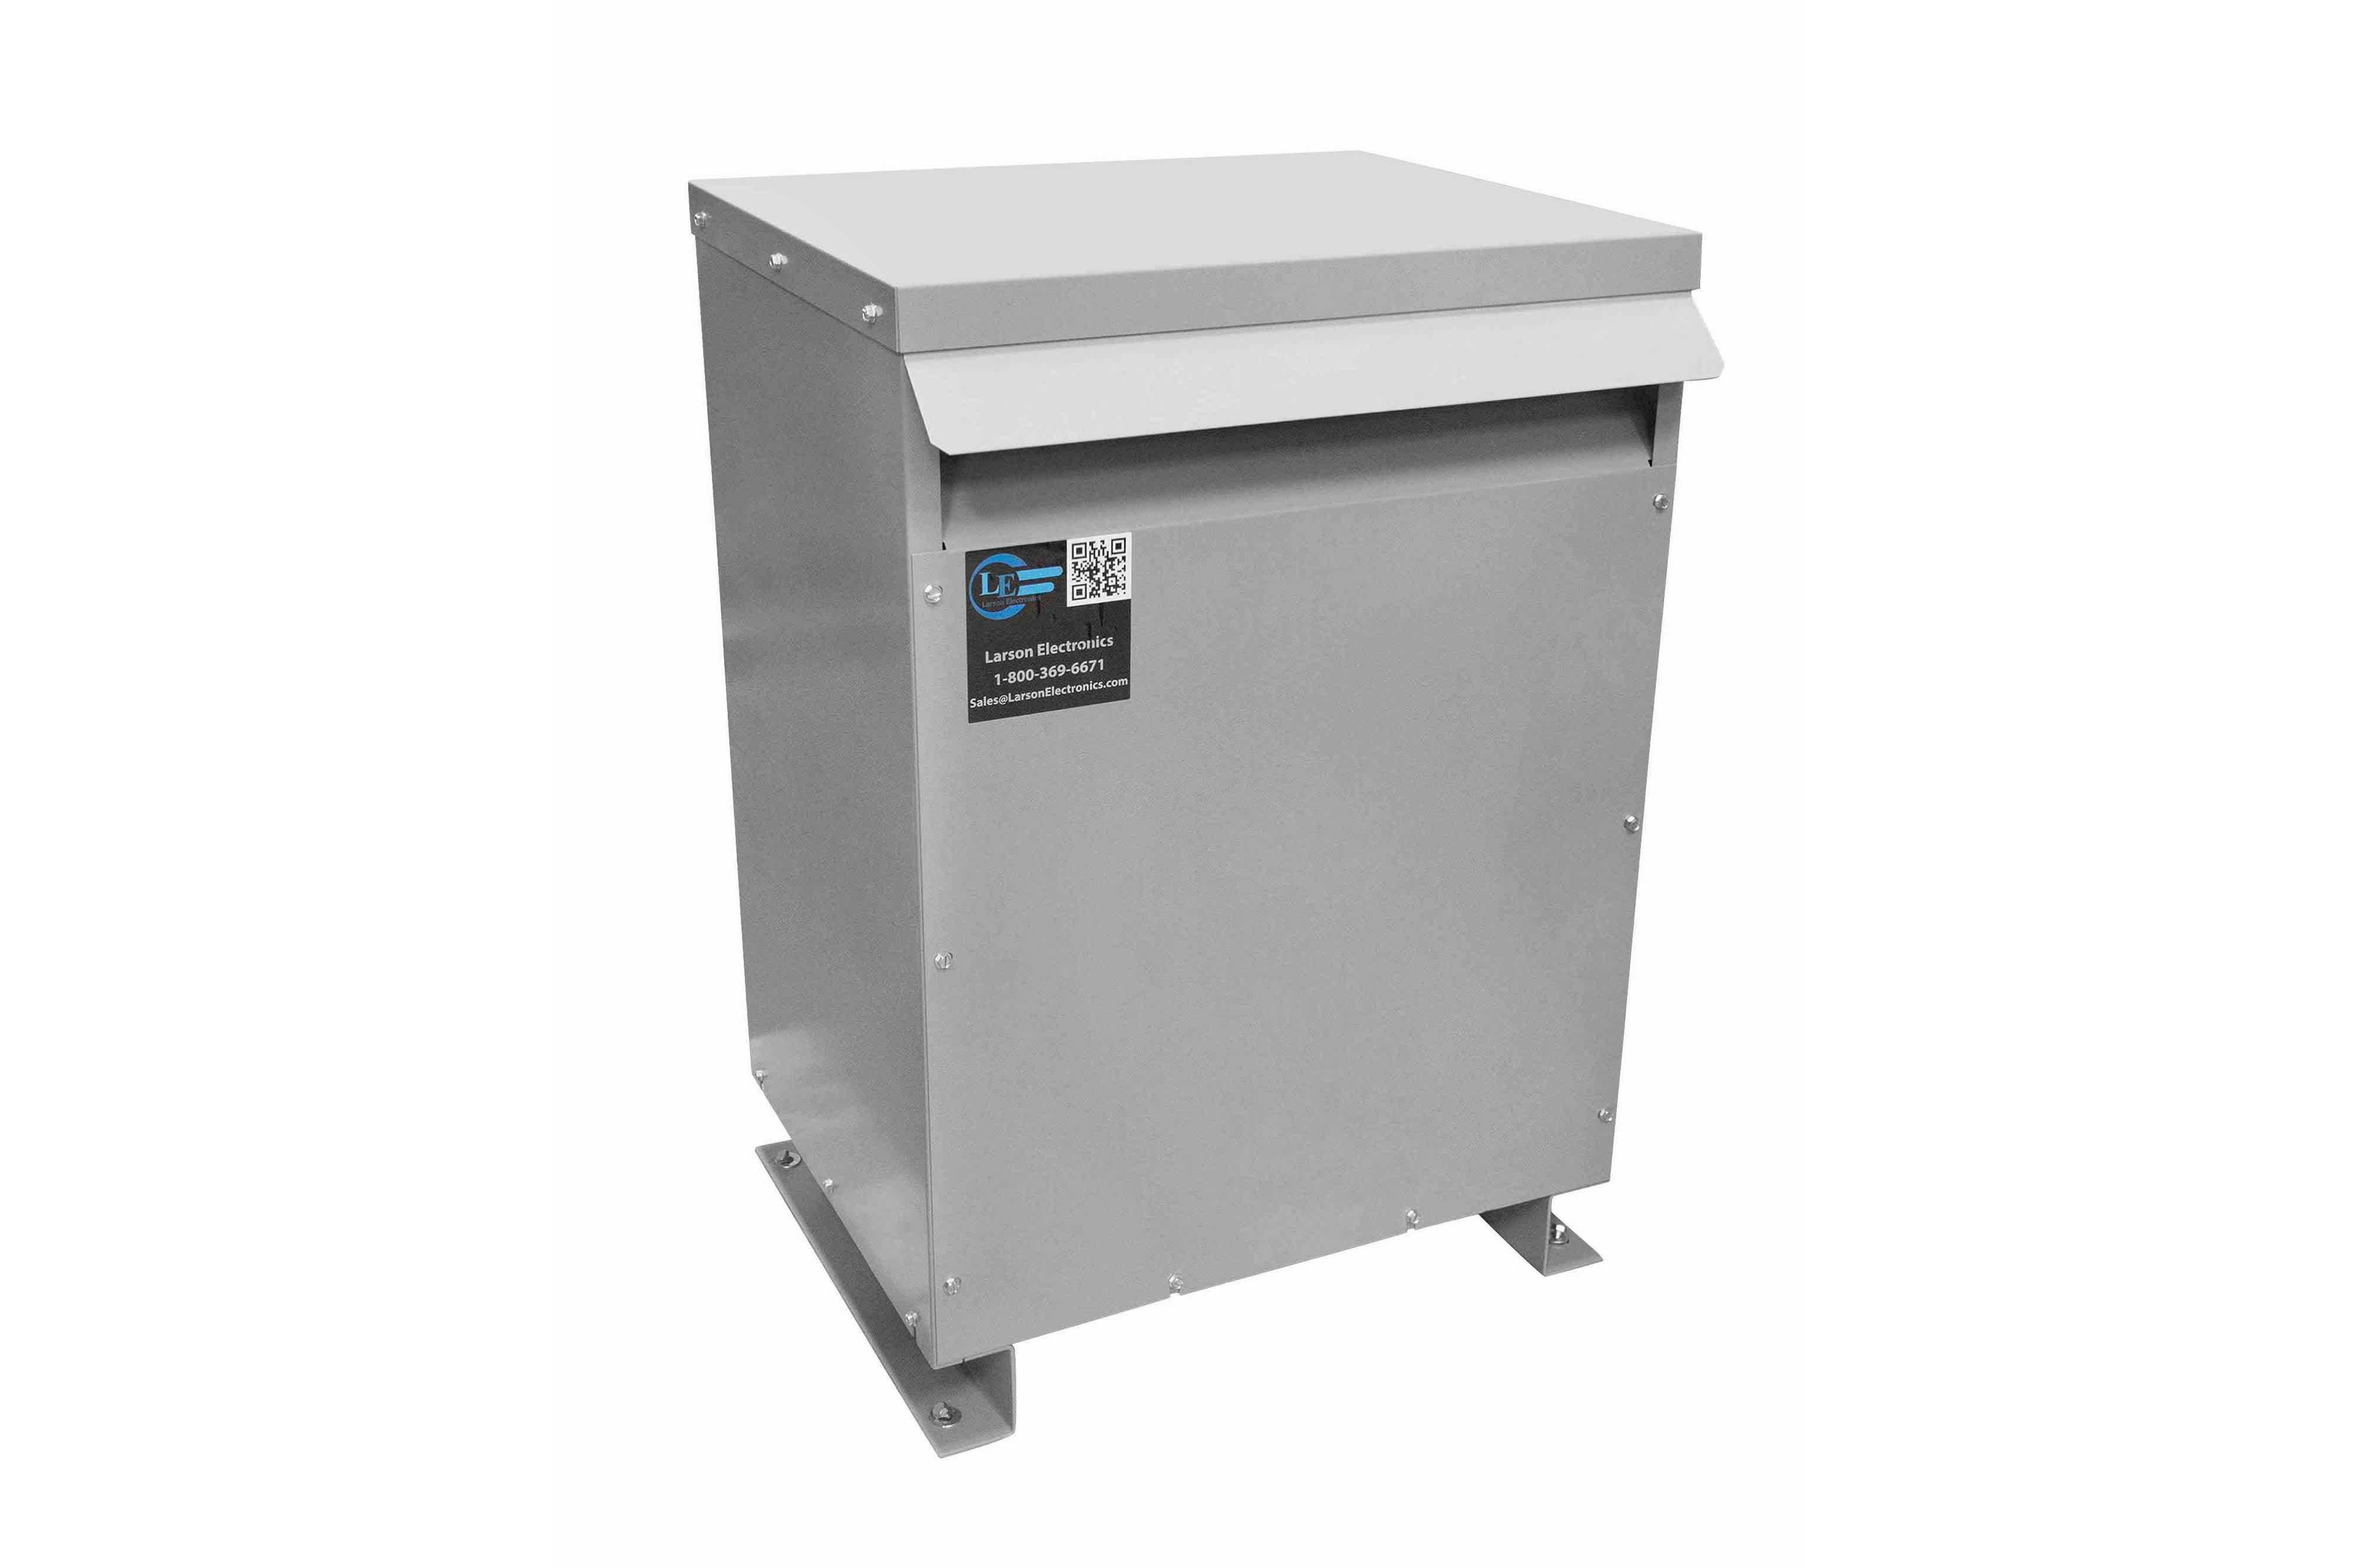 70 kVA 3PH Isolation Transformer, 380V Wye Primary, 208Y/120 Wye-N Secondary, N3R, Ventilated, 60 Hz